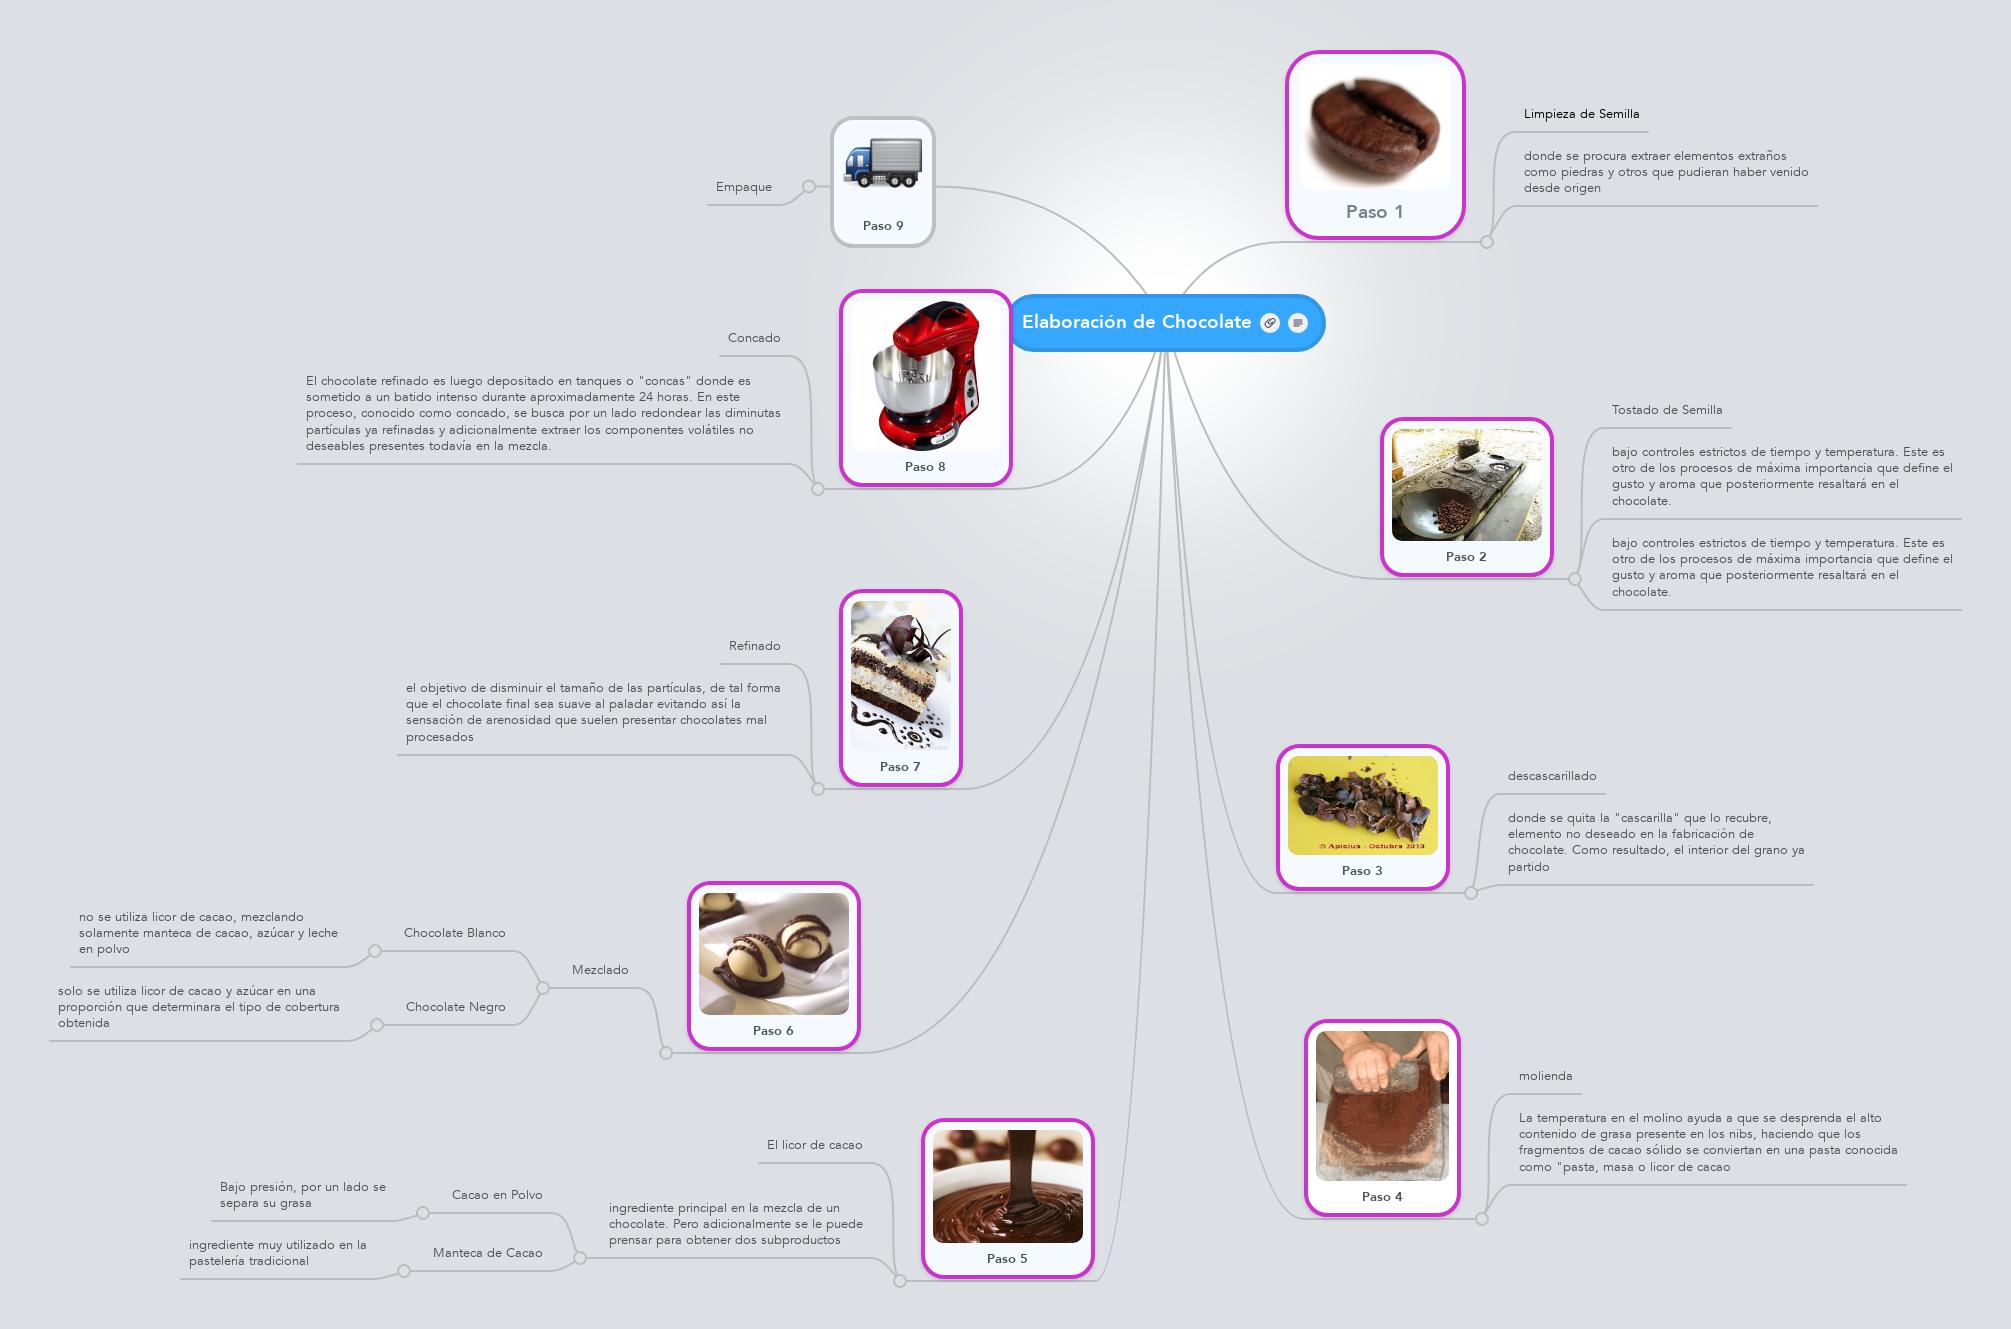 Elaboraci U00f3n De Chocolate